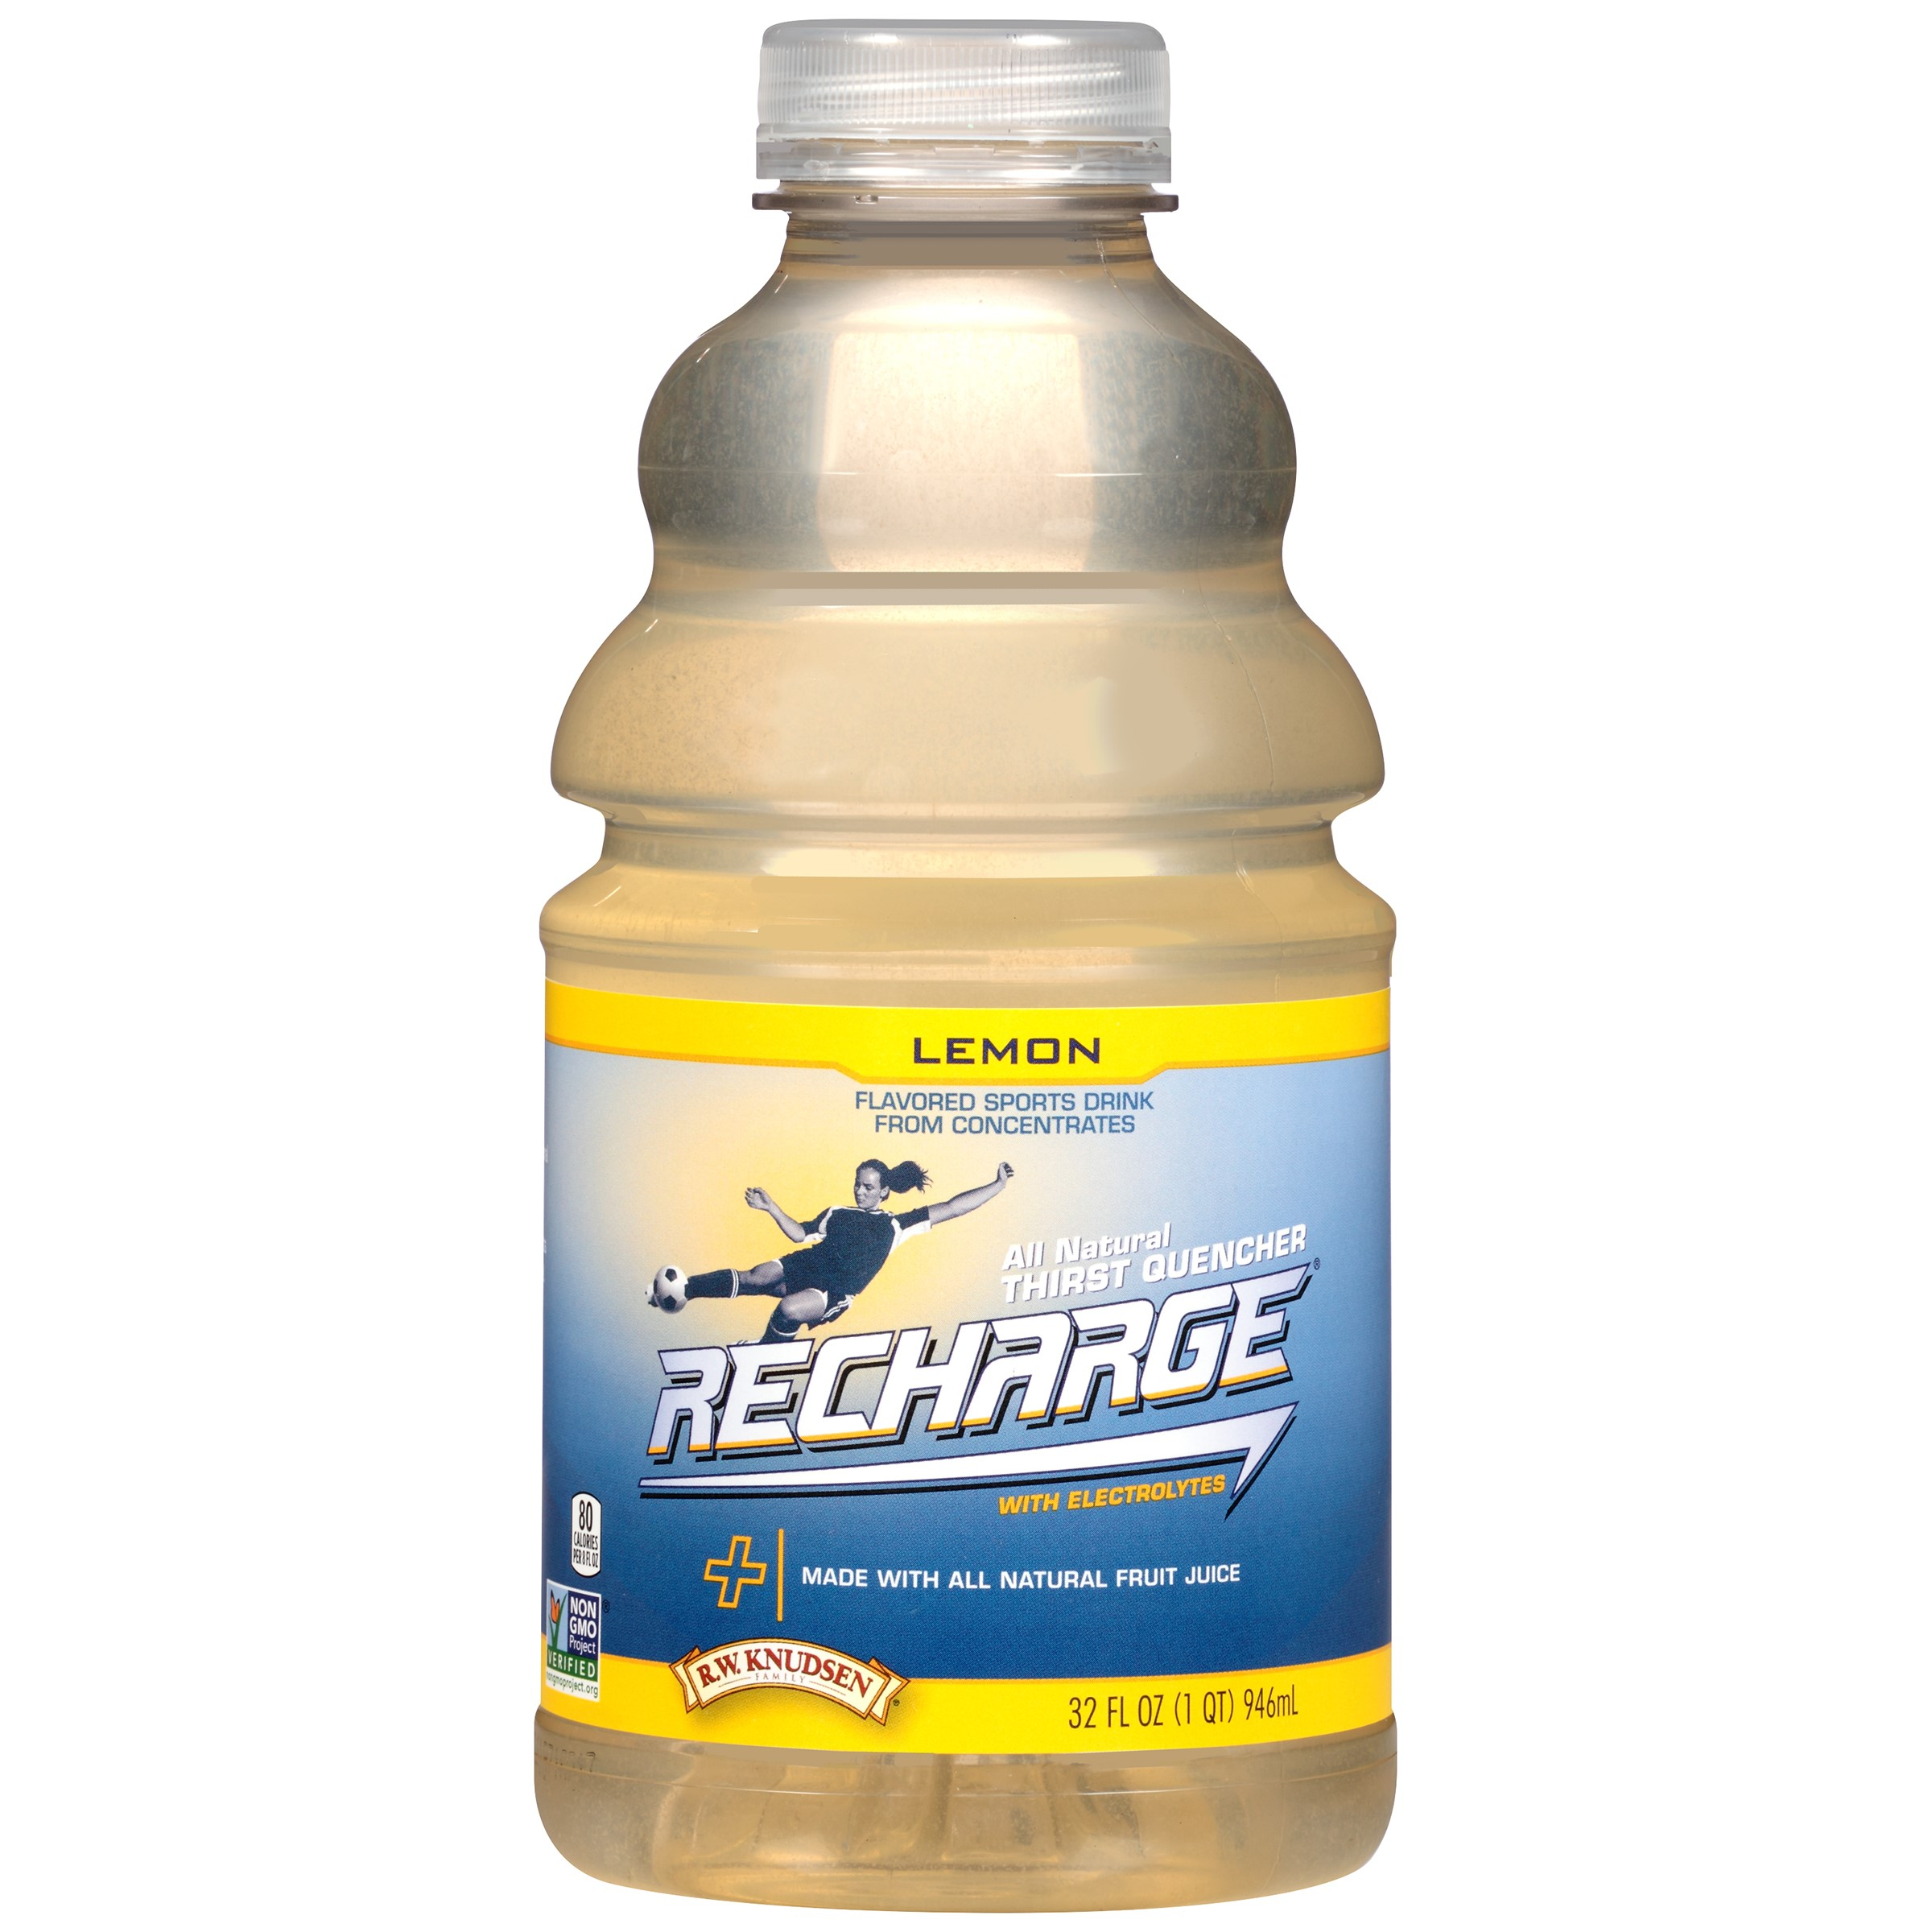 R.W. Knudsen Recharge, Lemon, 32 Fl Oz, 1 Ct